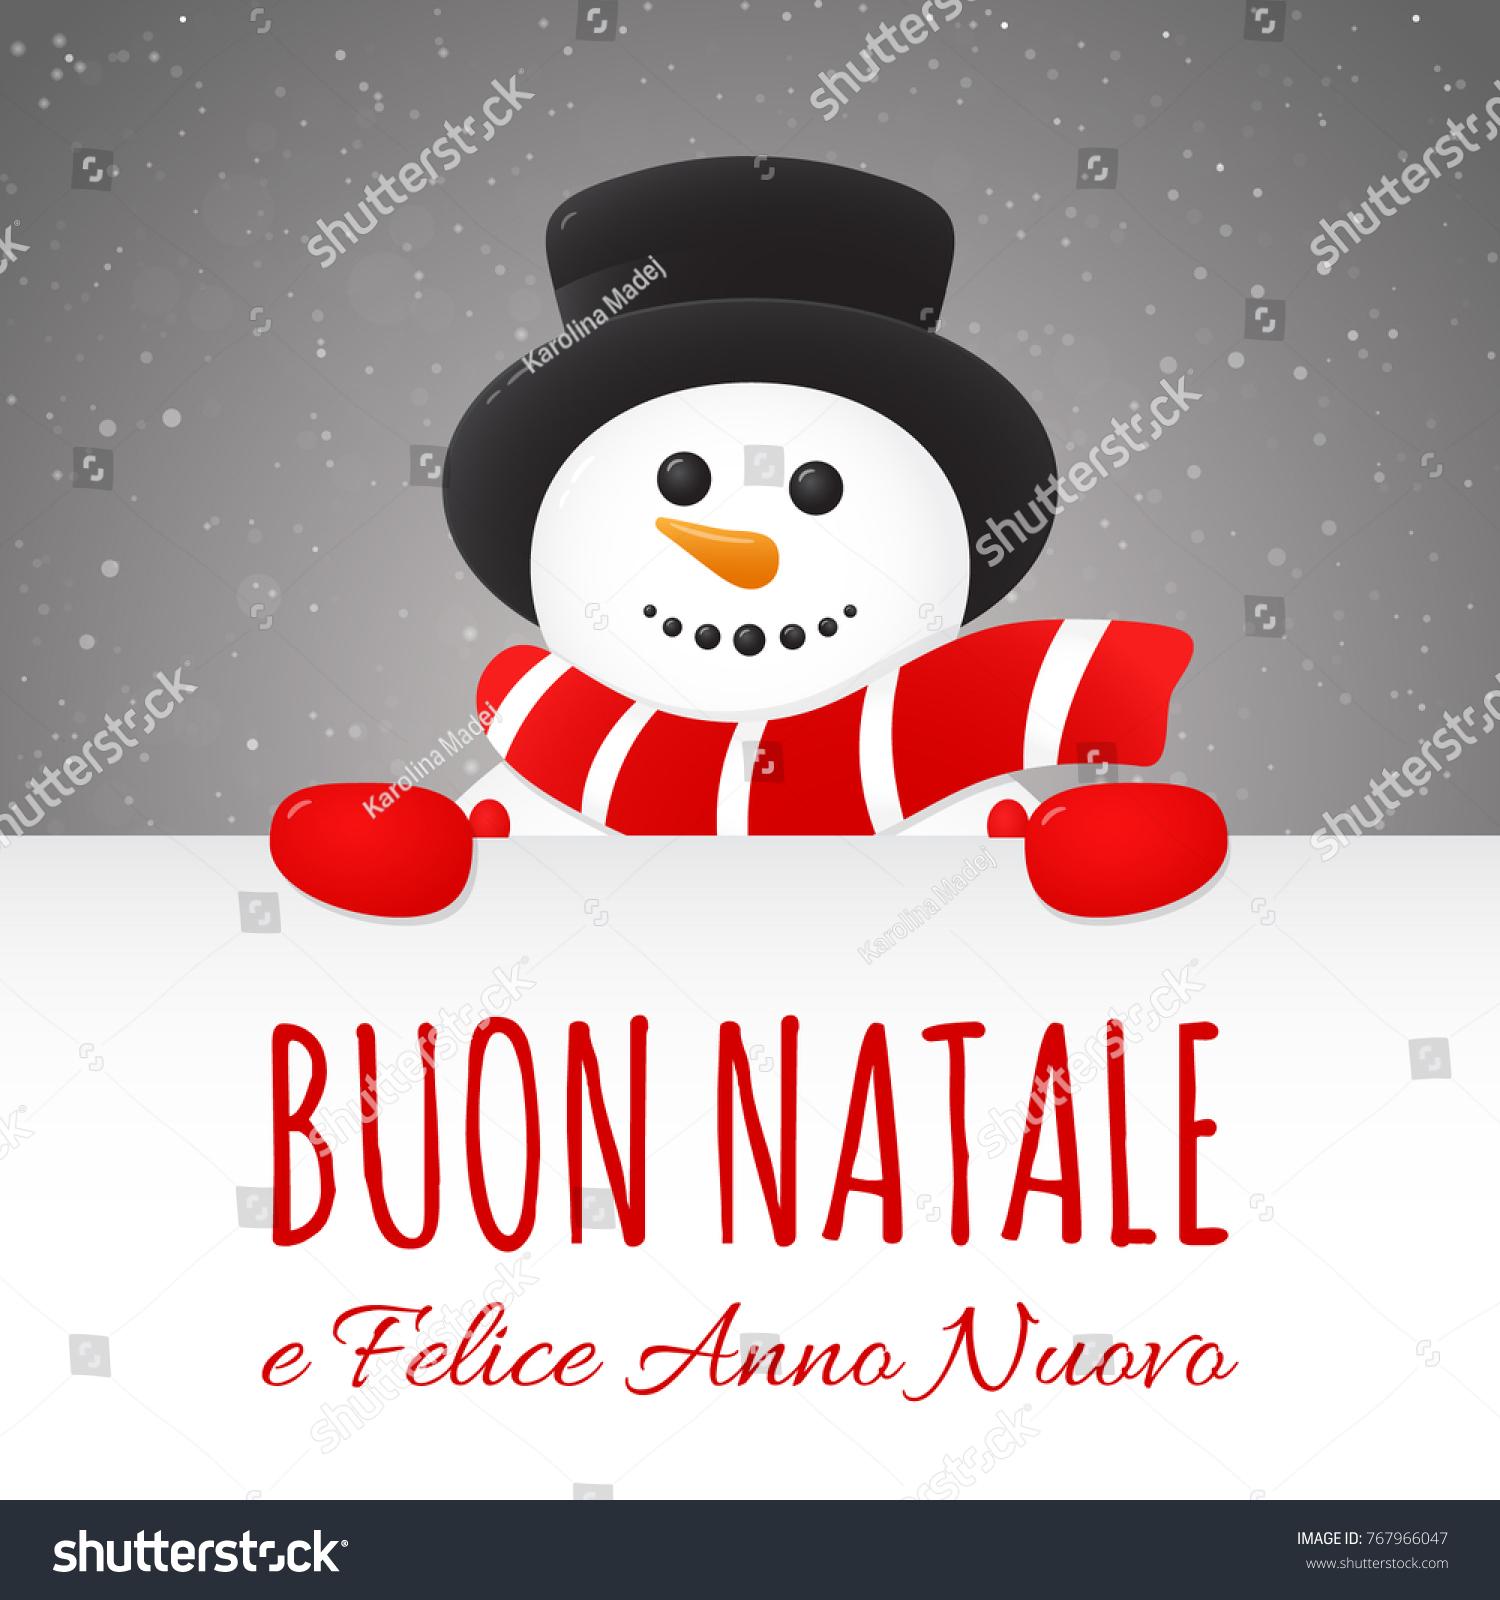 Merry Christmas Italian Buon Natale Concept Stock Vector 767966047